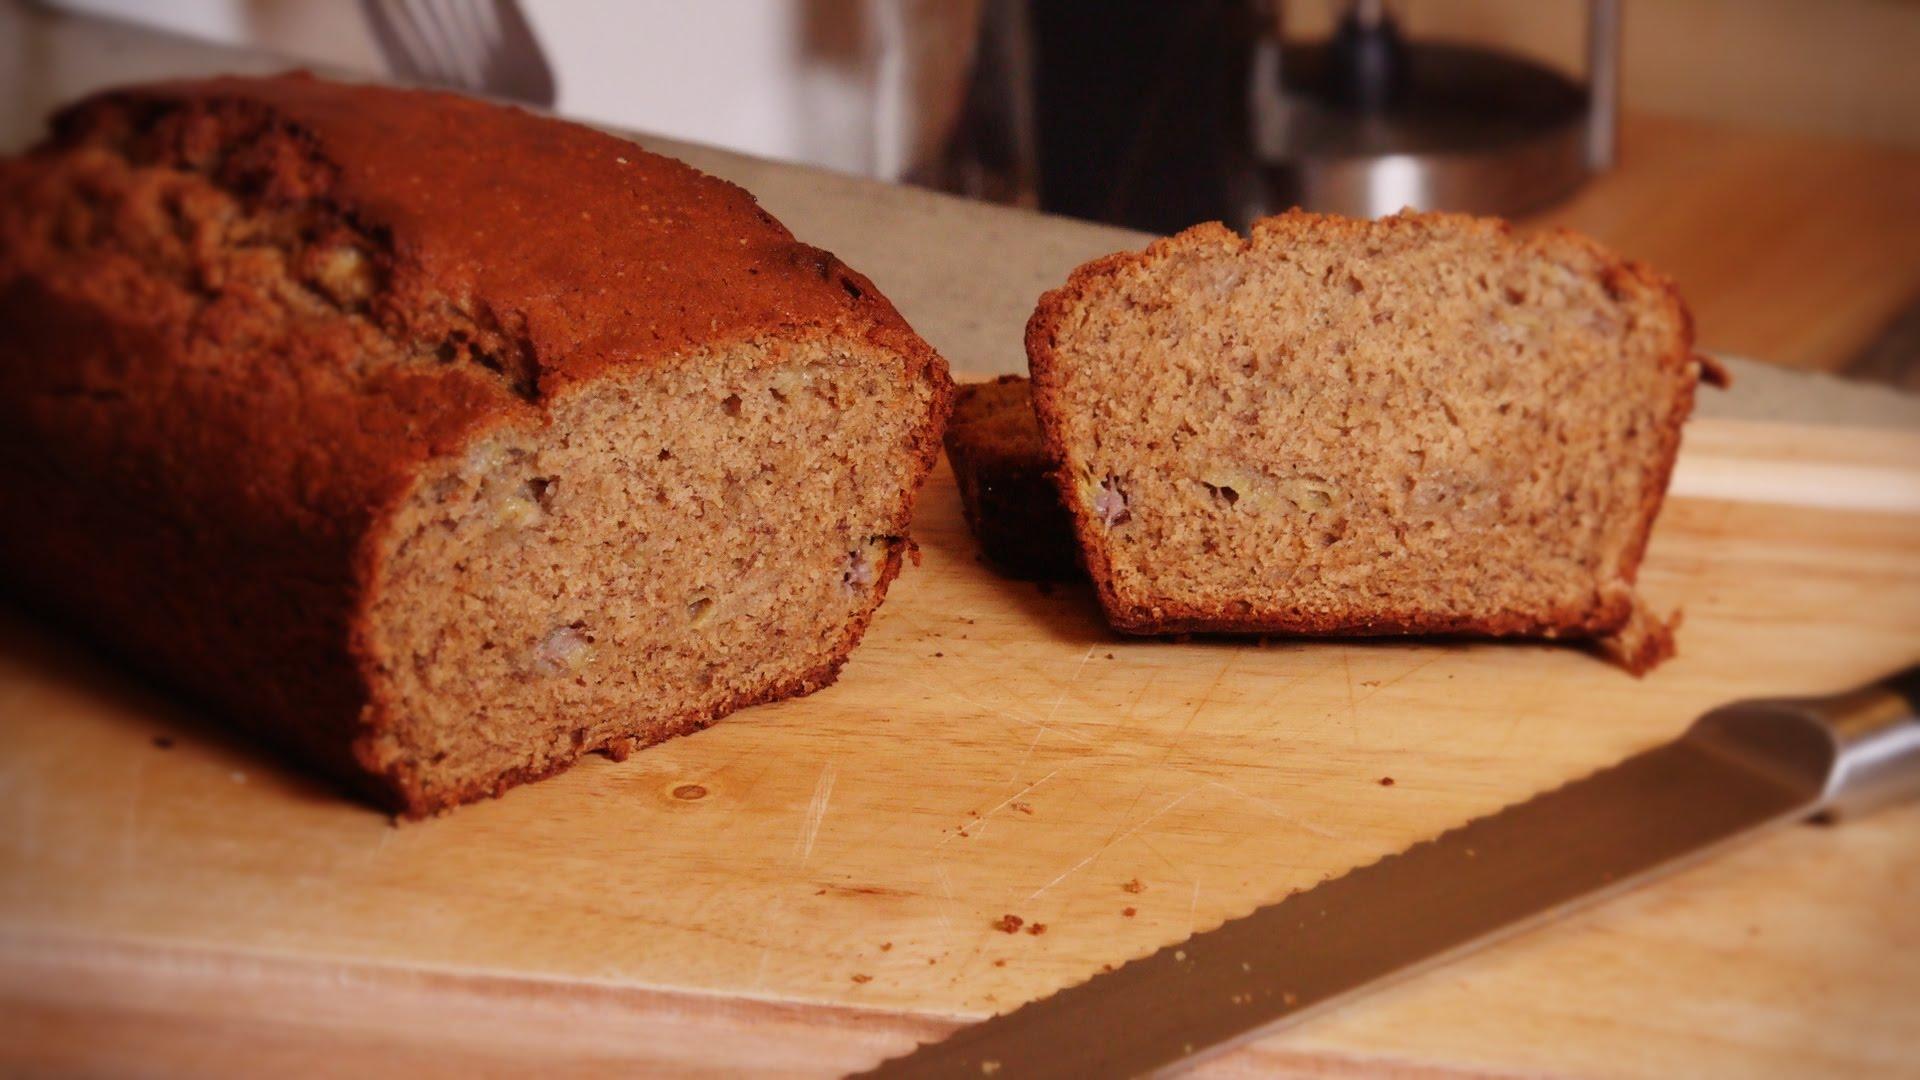 ABV Marijuana Butter and CannaBanana Bread Cooking with Marijuana #20